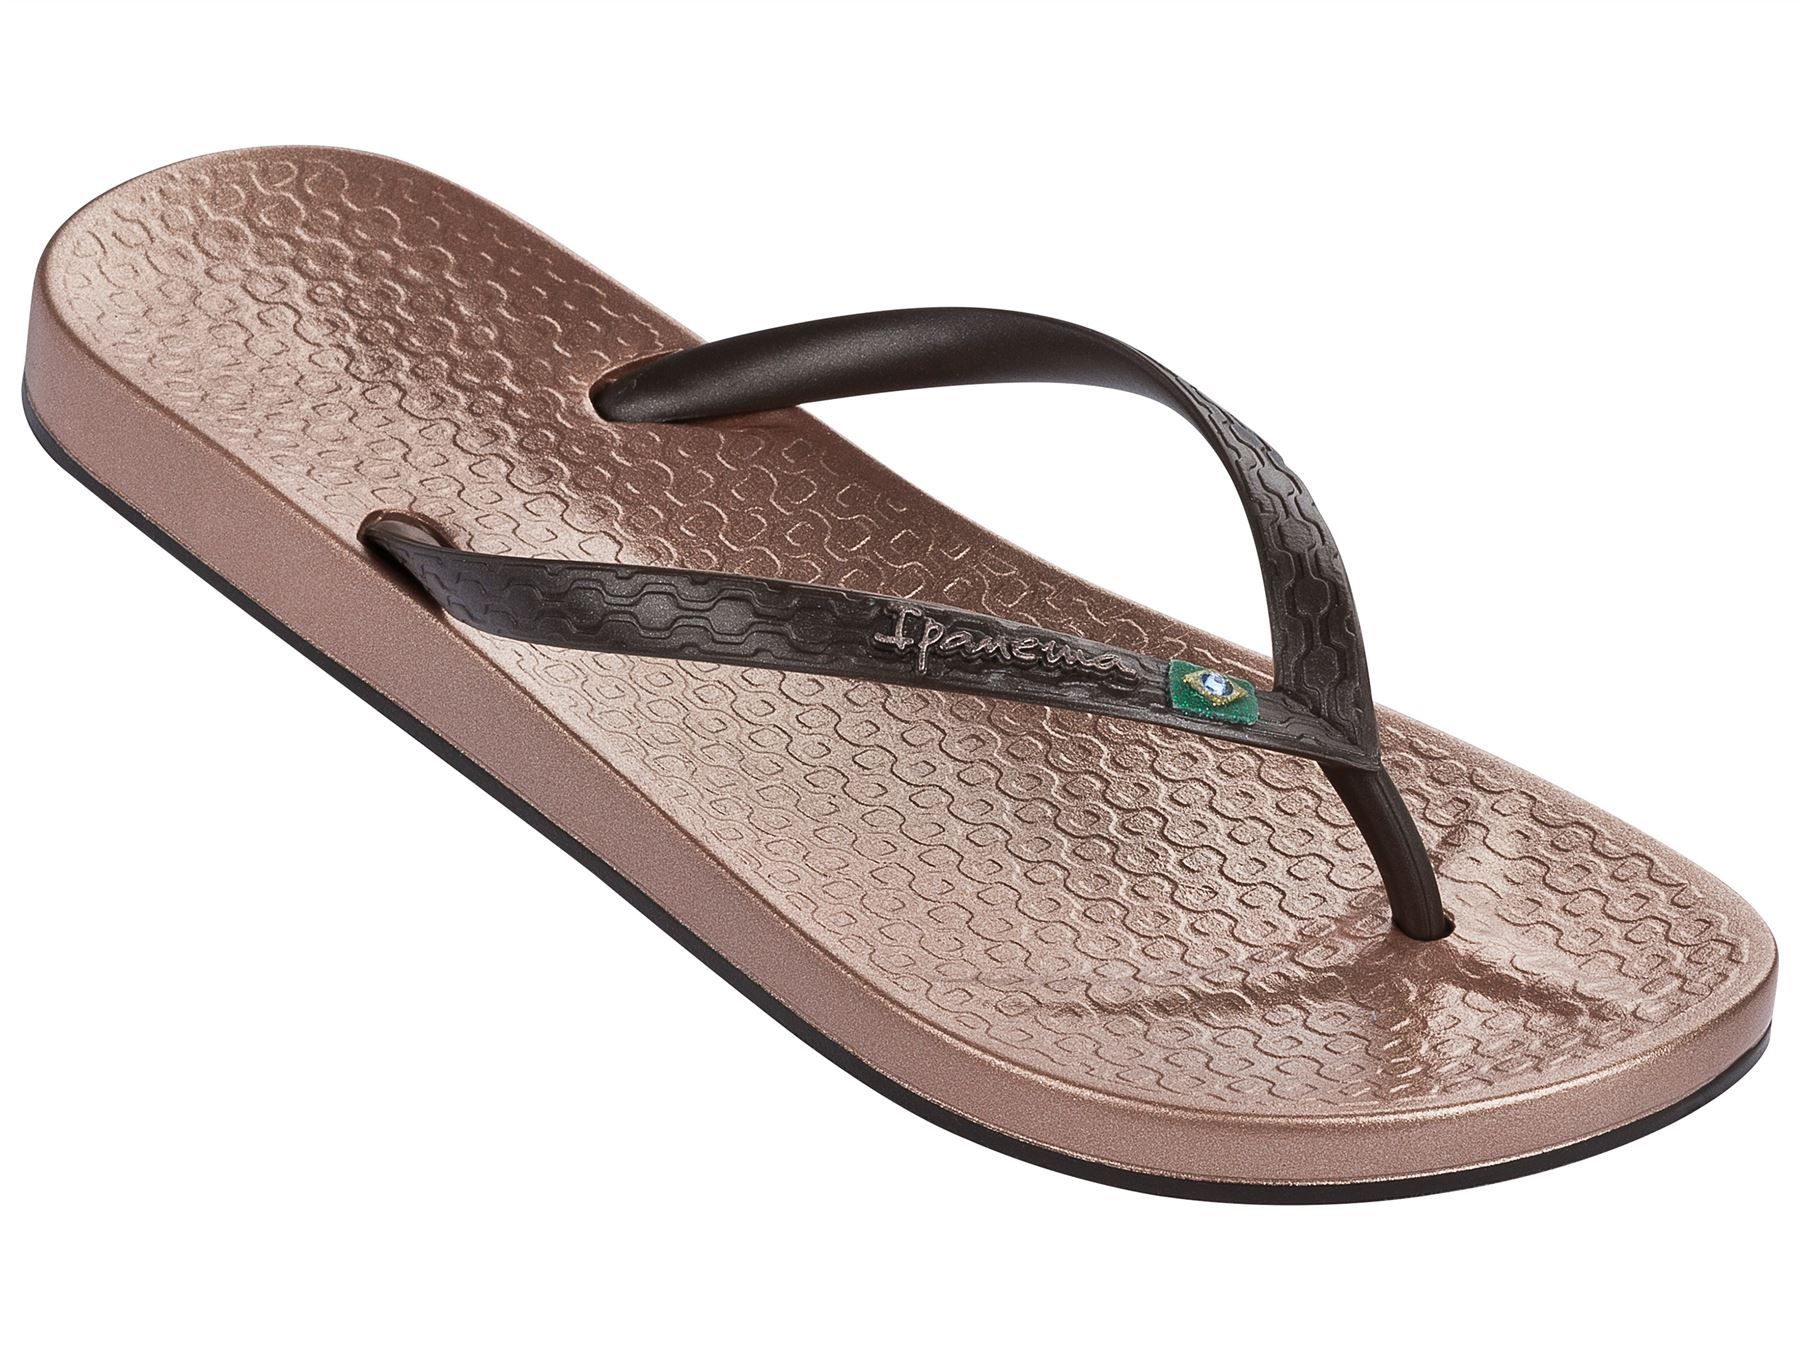 Ipanema-plage-Bresil-Drapeau-Fin-SEMELLE-sandales-tongs-plage-80403